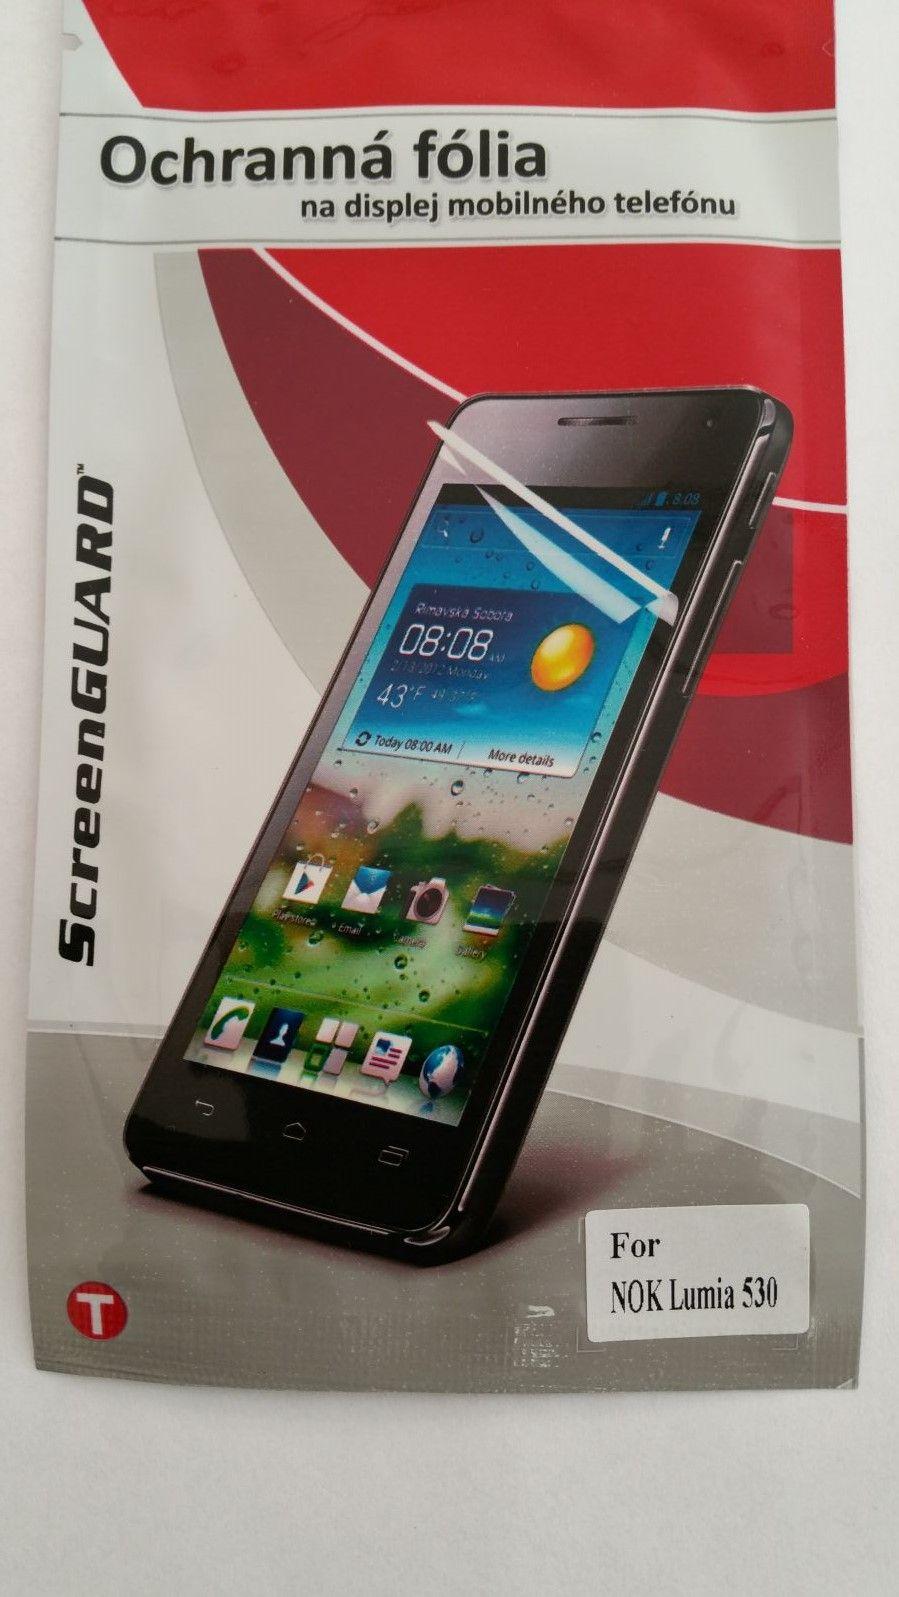 Ochranná folie Mobilnet Nokia Lumia 530